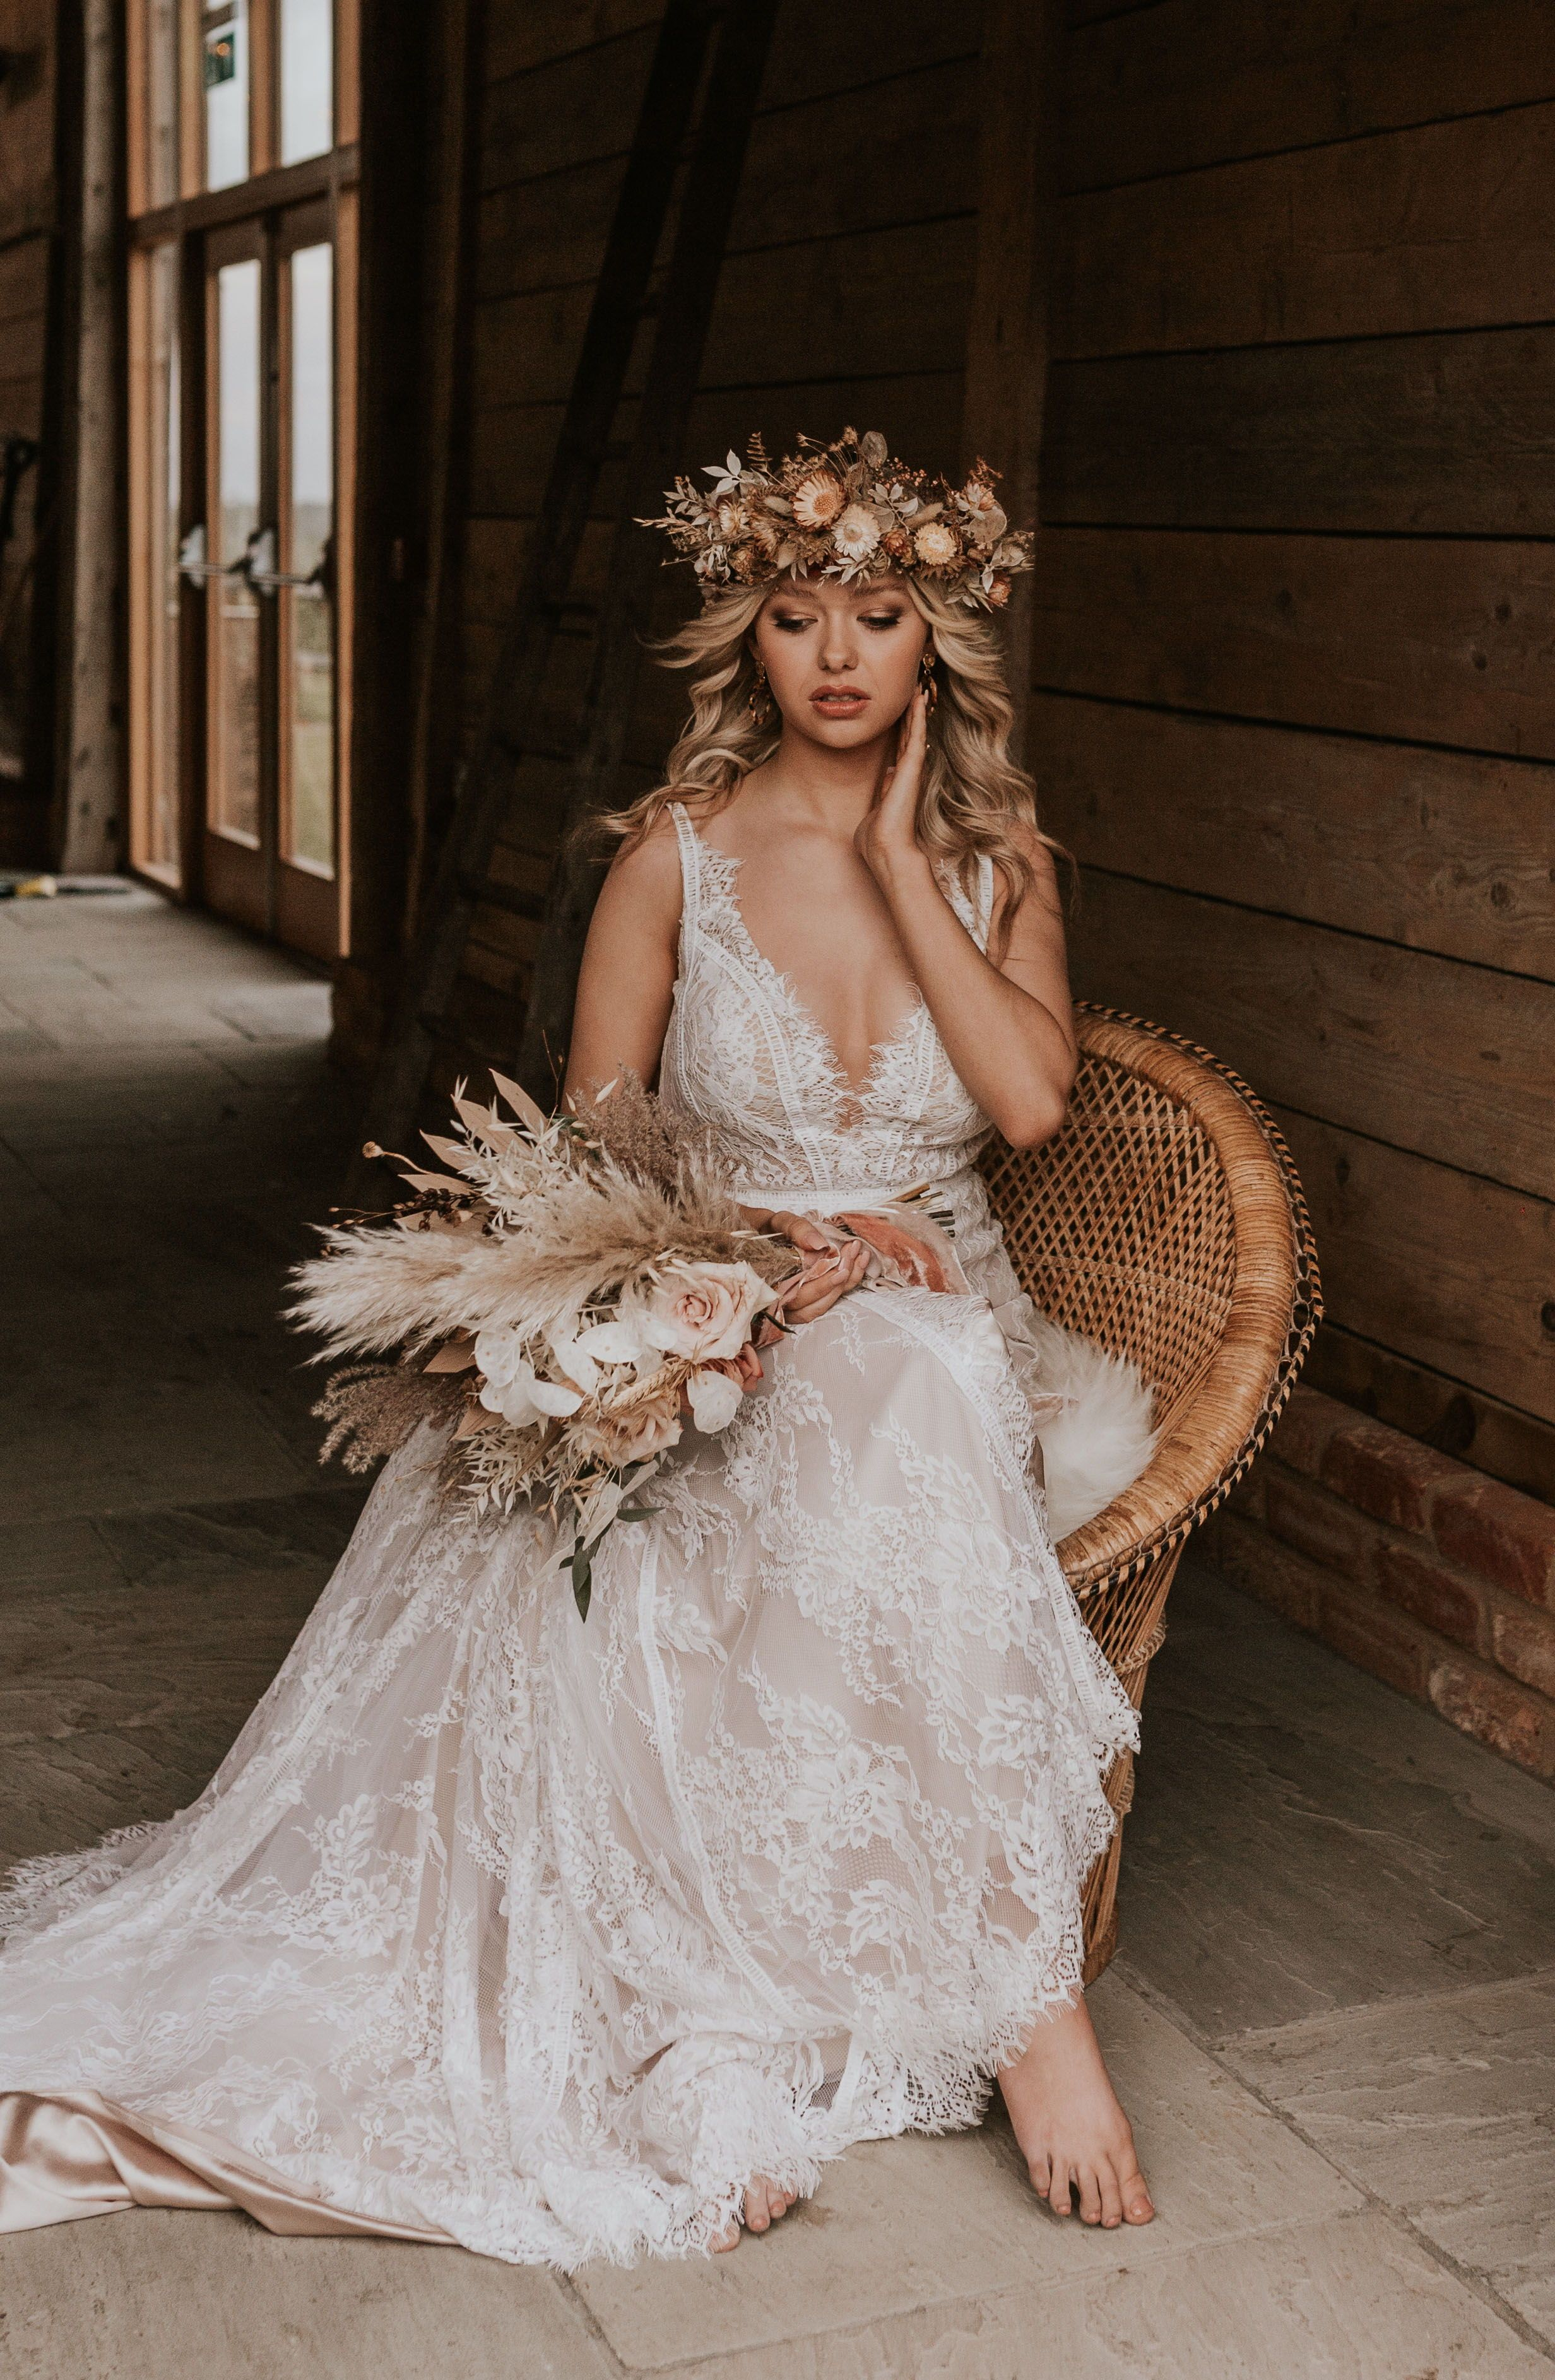 28+ Elopement wedding dress ideas in 2021